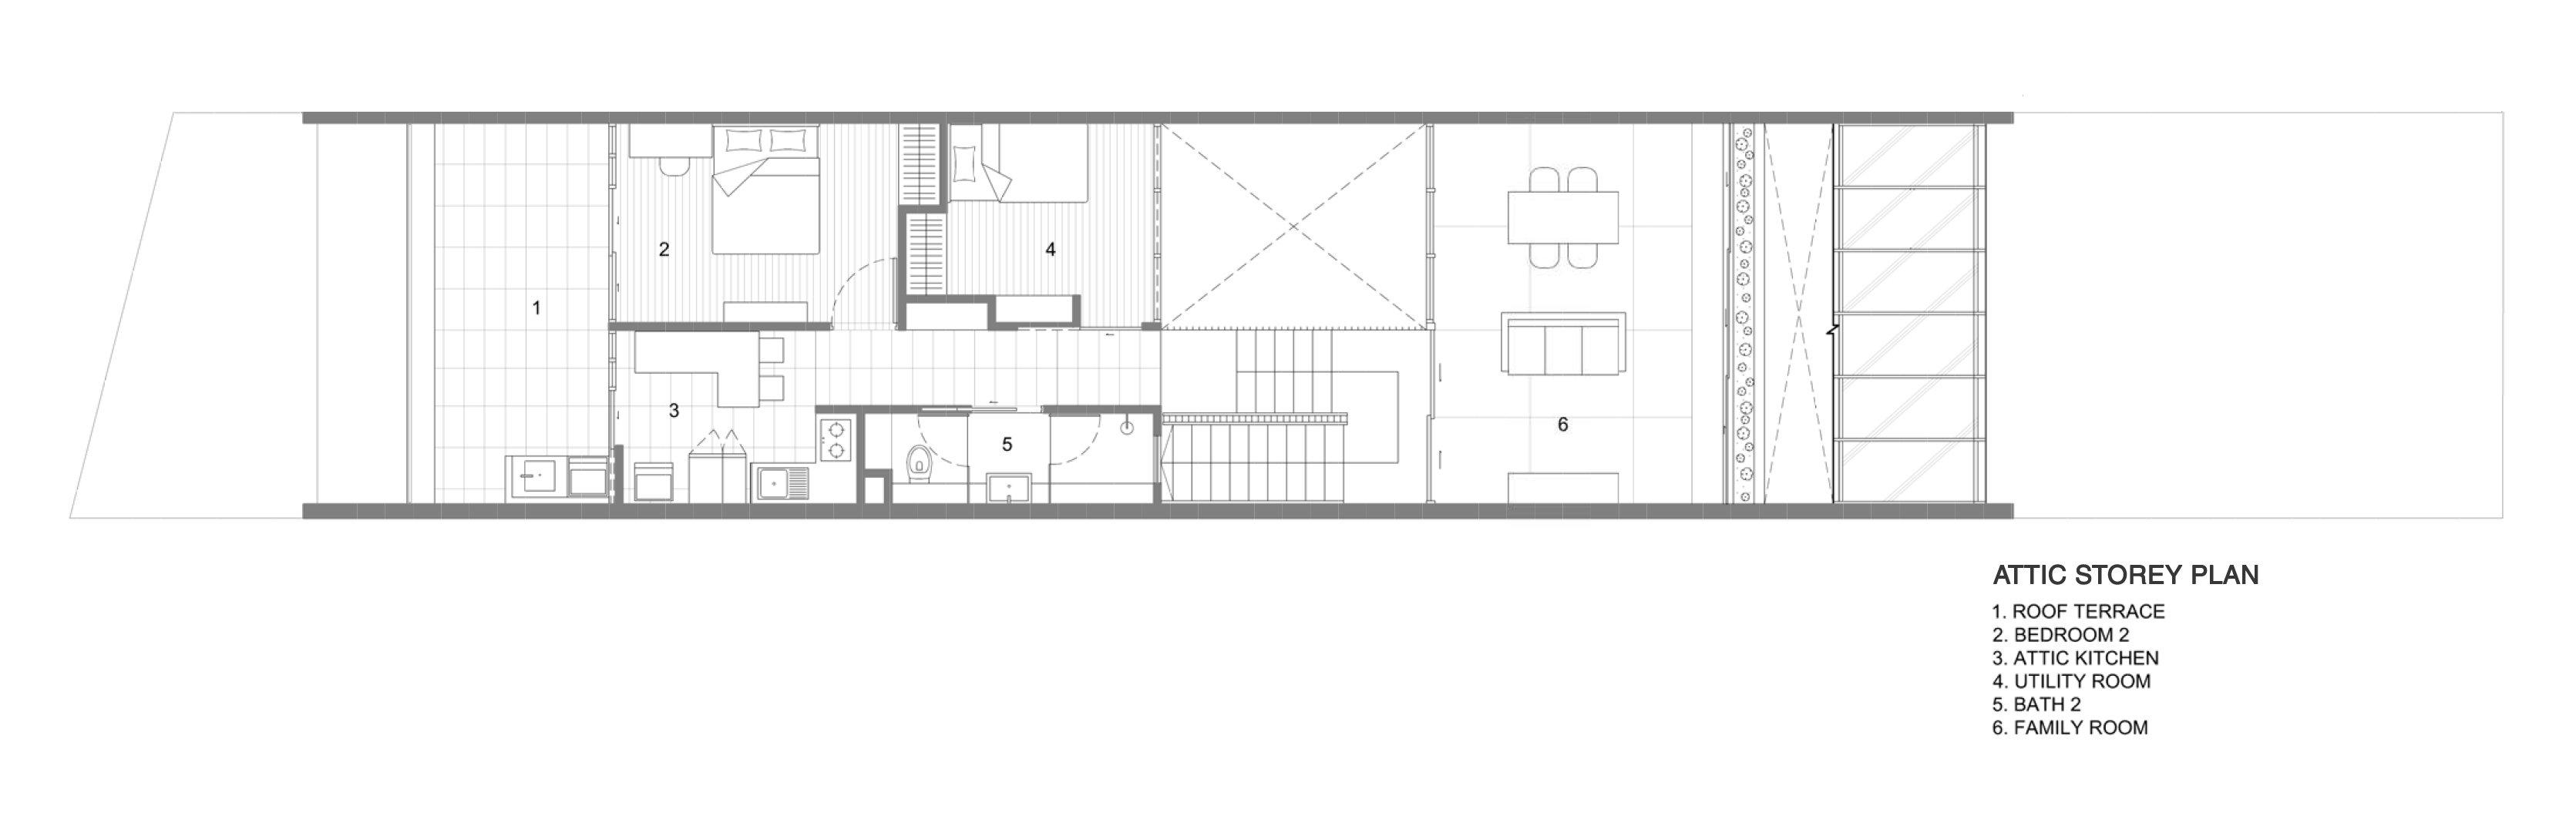 Attic Storey Plan Formwerkz Architects}